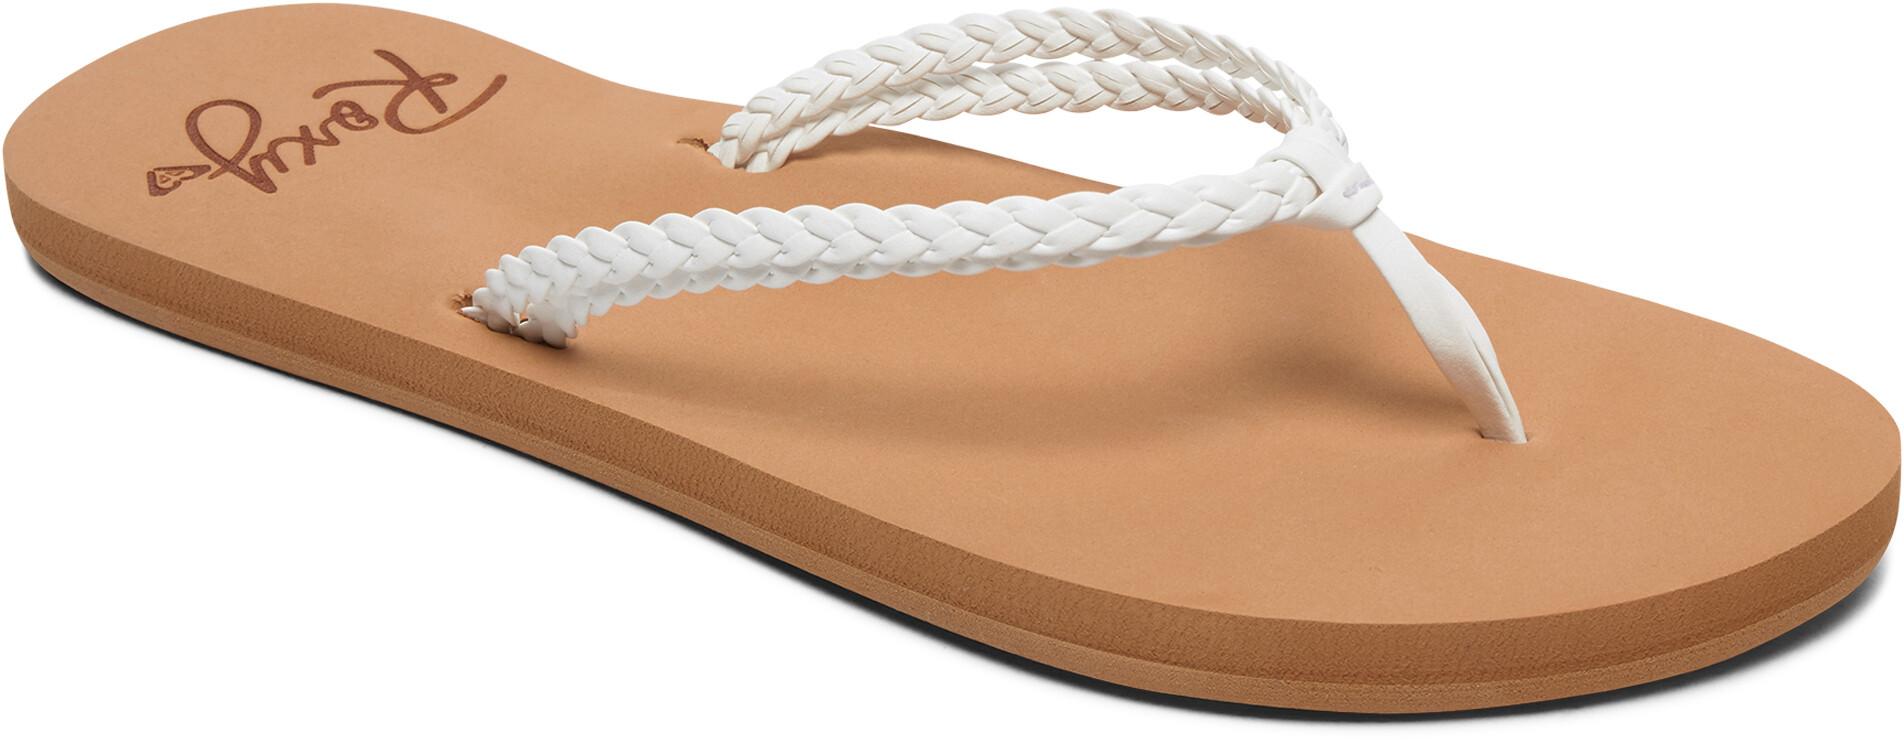 864b86669e16 Roxy Costas Sandals Women White